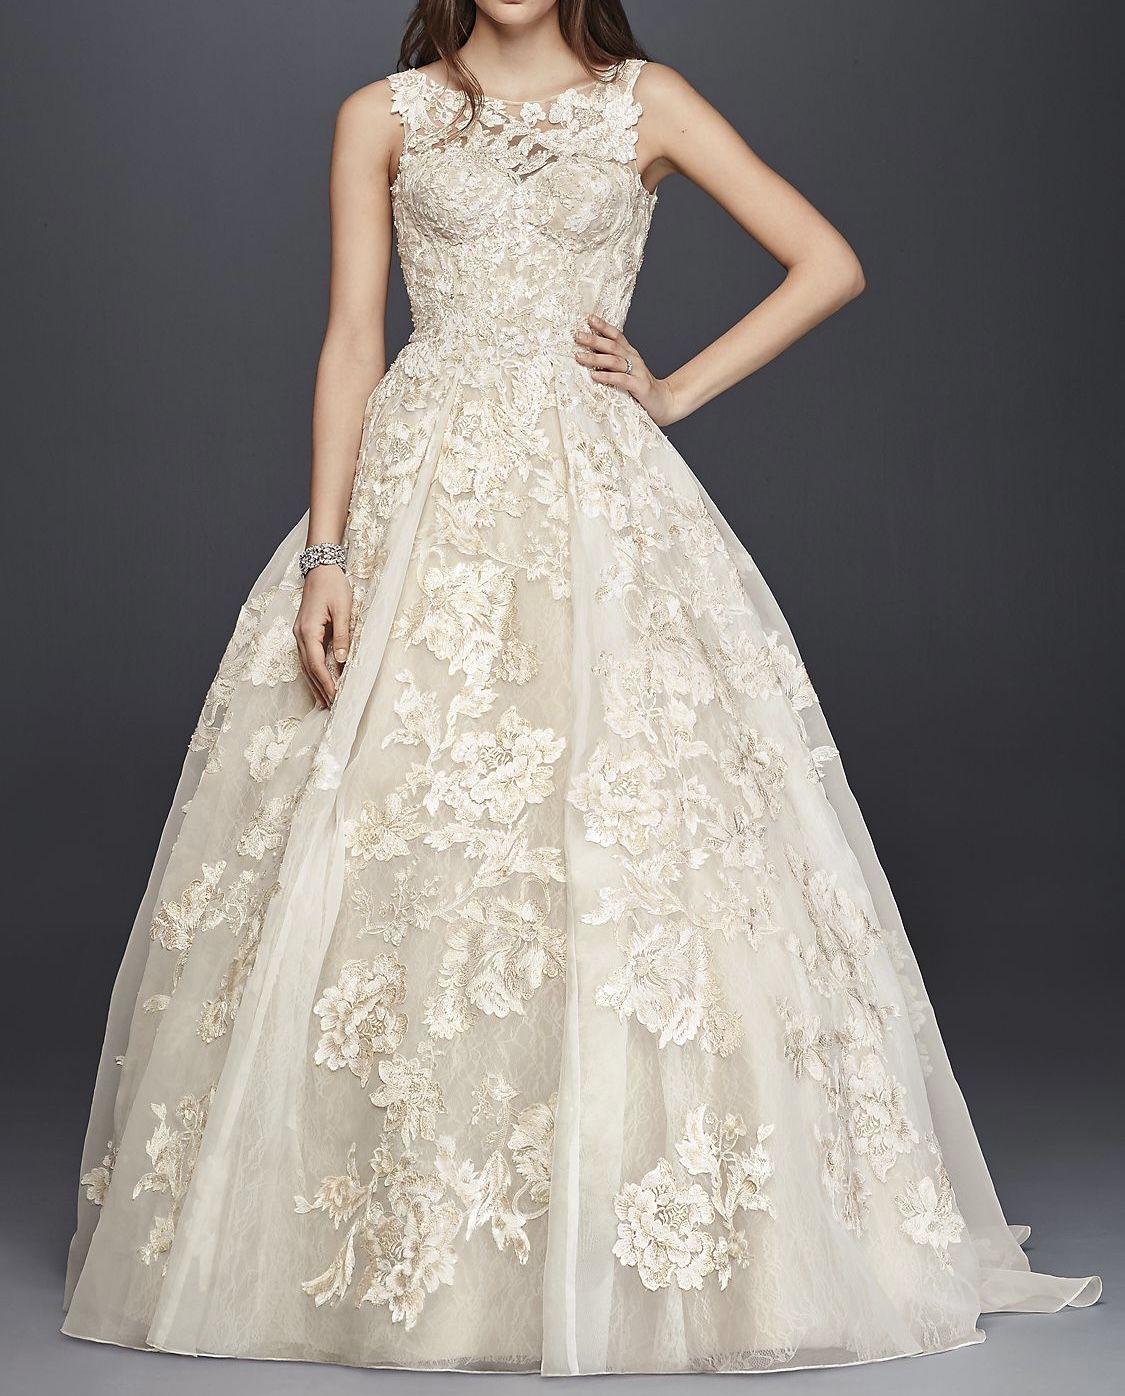 Oleg Cassini High Neck Tank Lace Wedding Dress